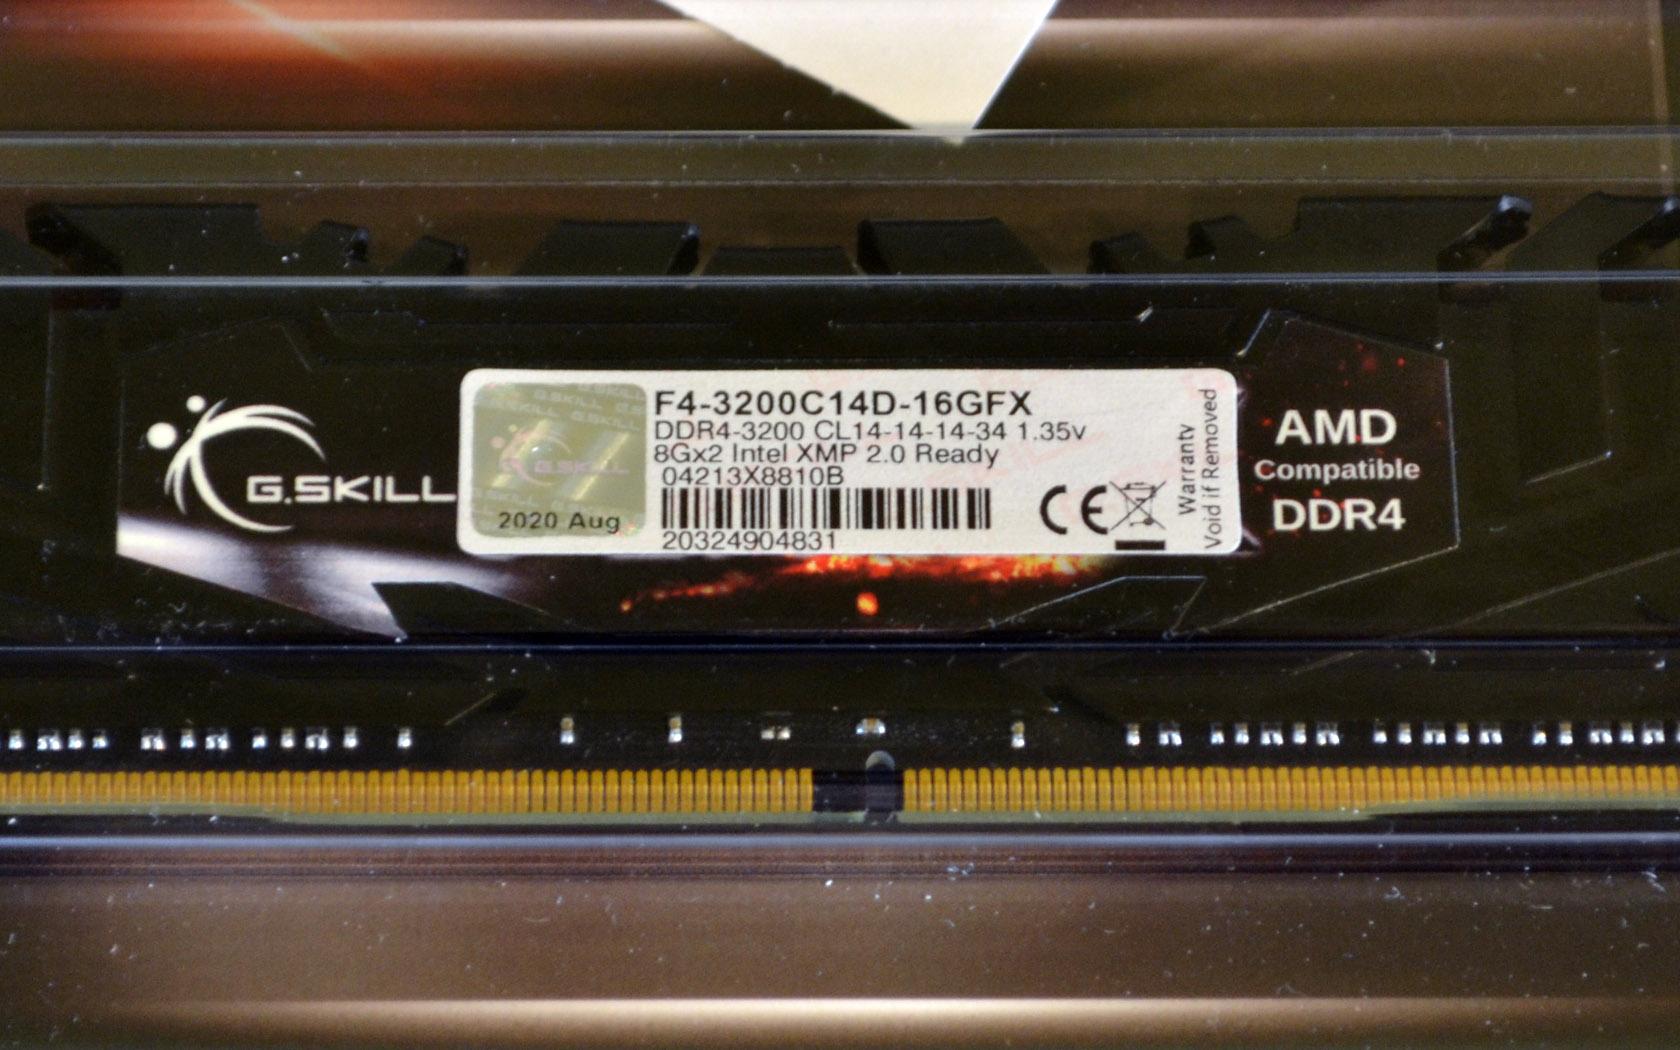 DSC-5565.jpg